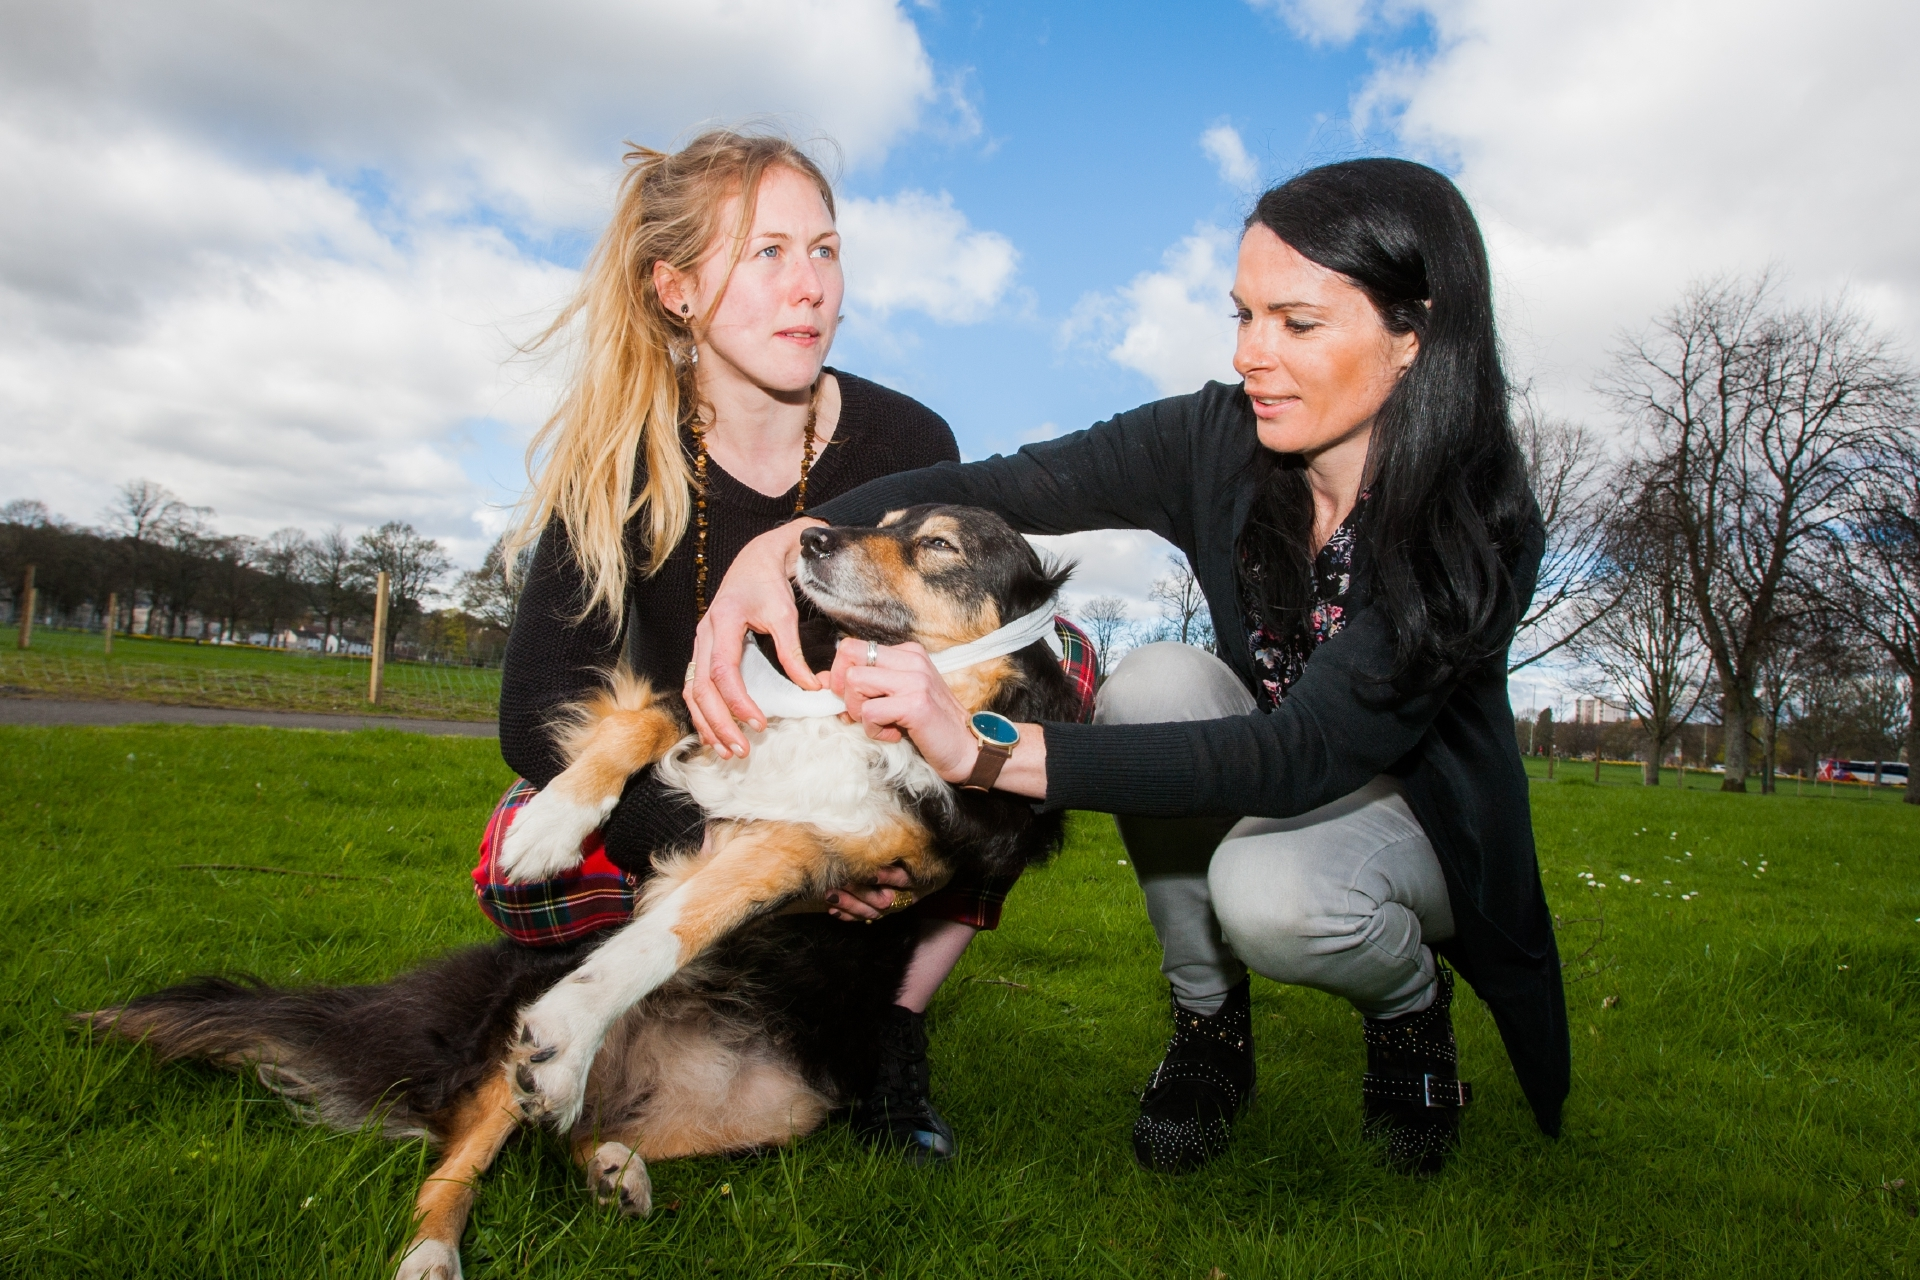 Leah Farquharson (Membership Development, Woodland Trust Scotland) helps as Gayle Ritchie bandages Leah's dog, Leo.